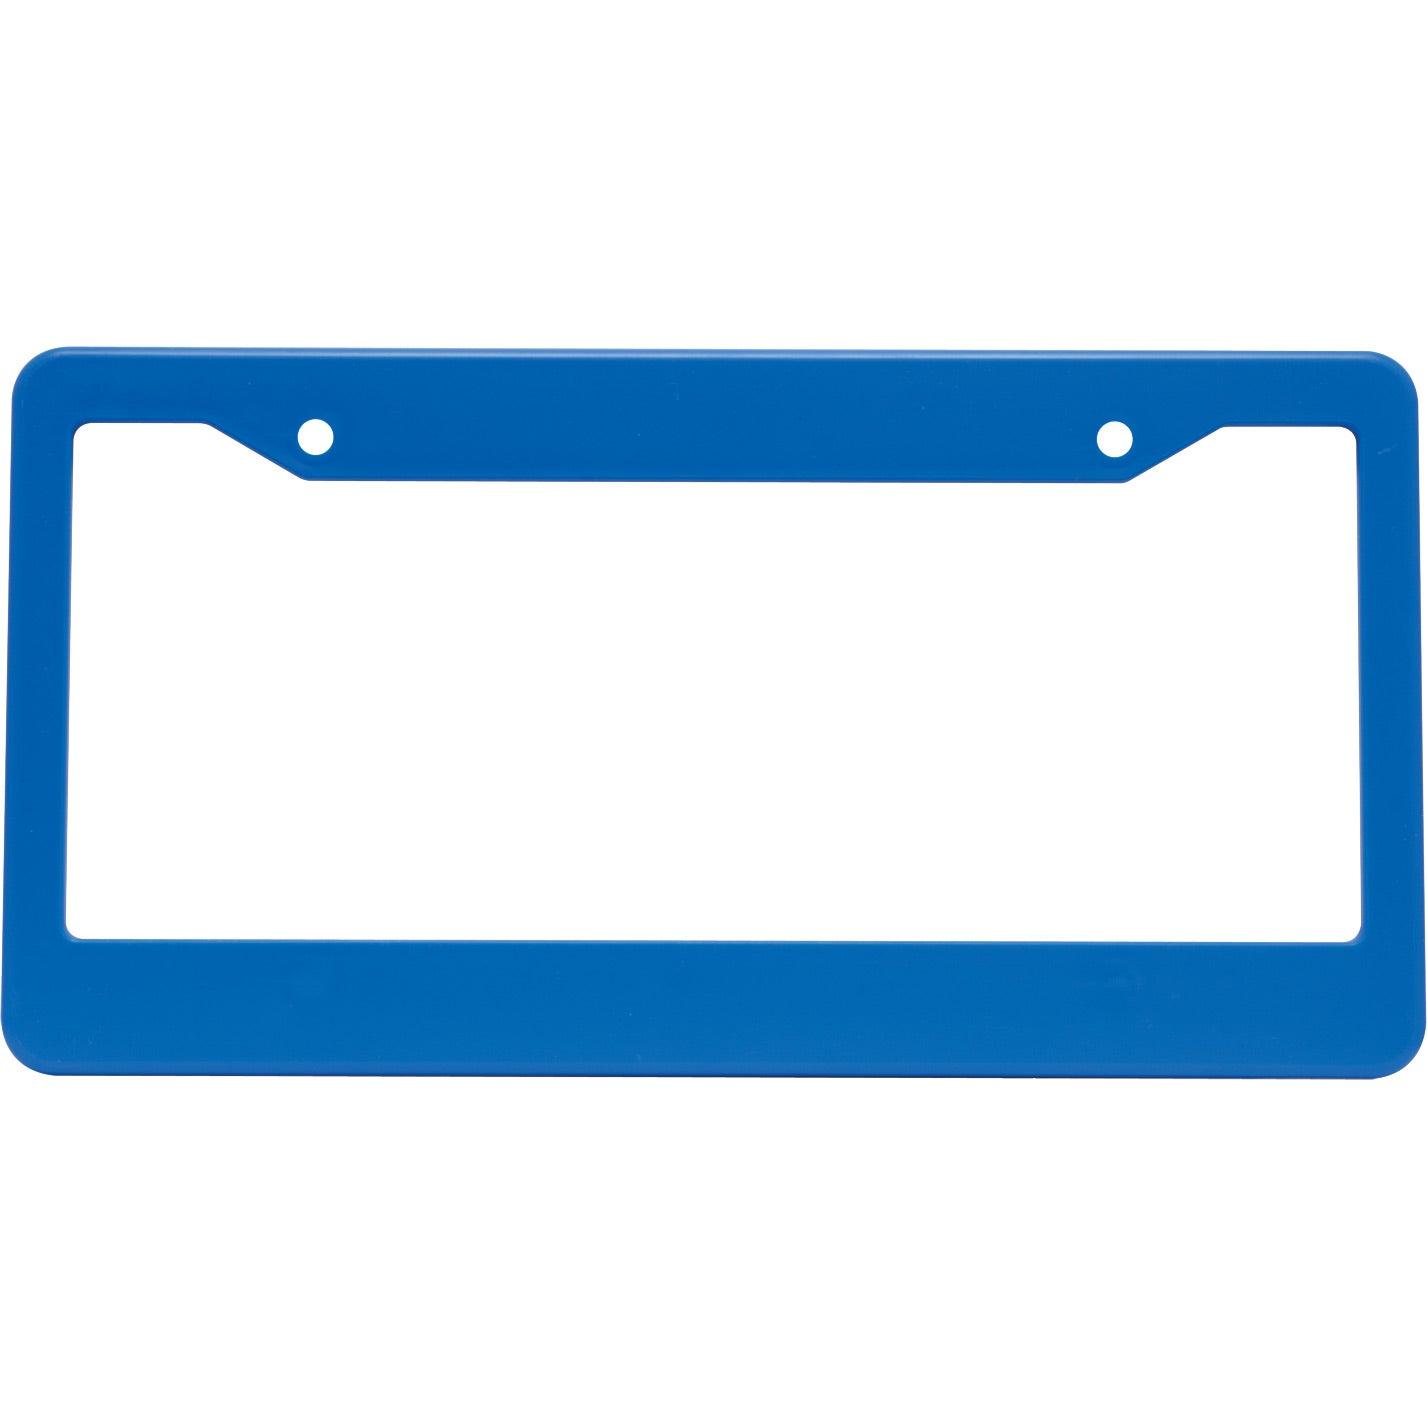 Blank license plate template printable